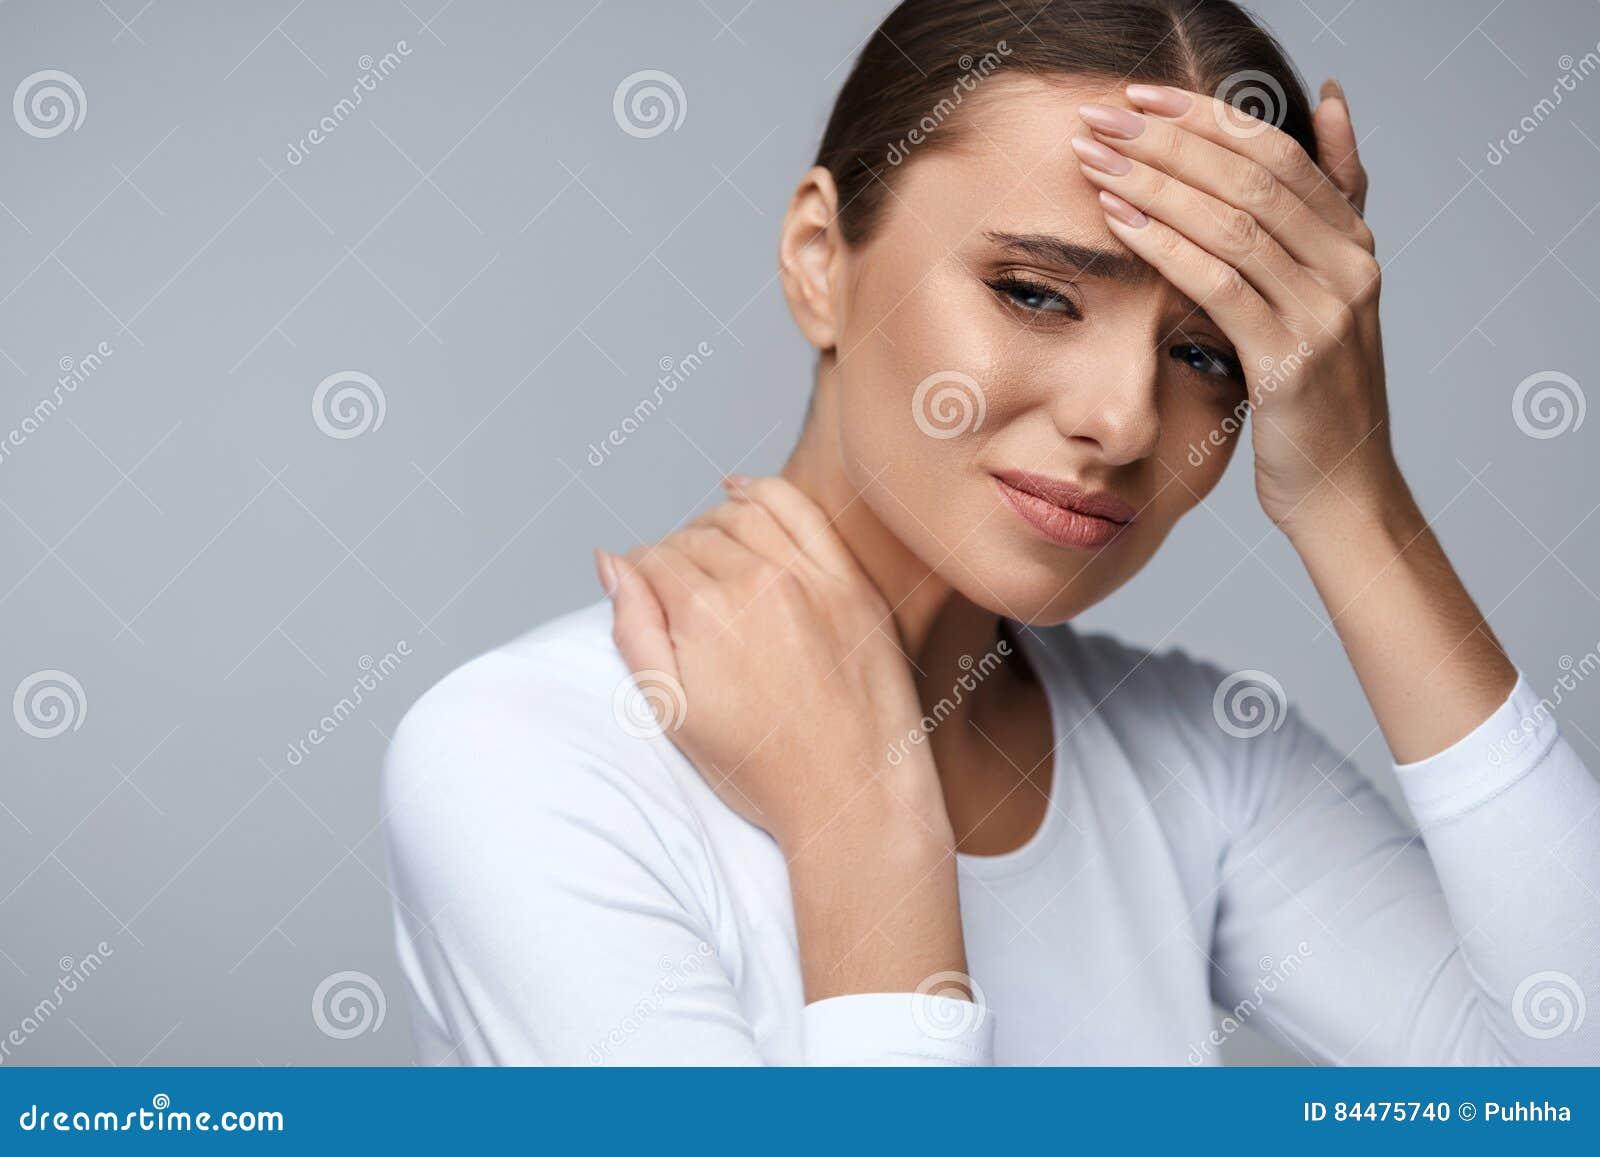 Pięknej kobiety Czuciowa choroba, Mieć migrenę, Bolesny ciało ból